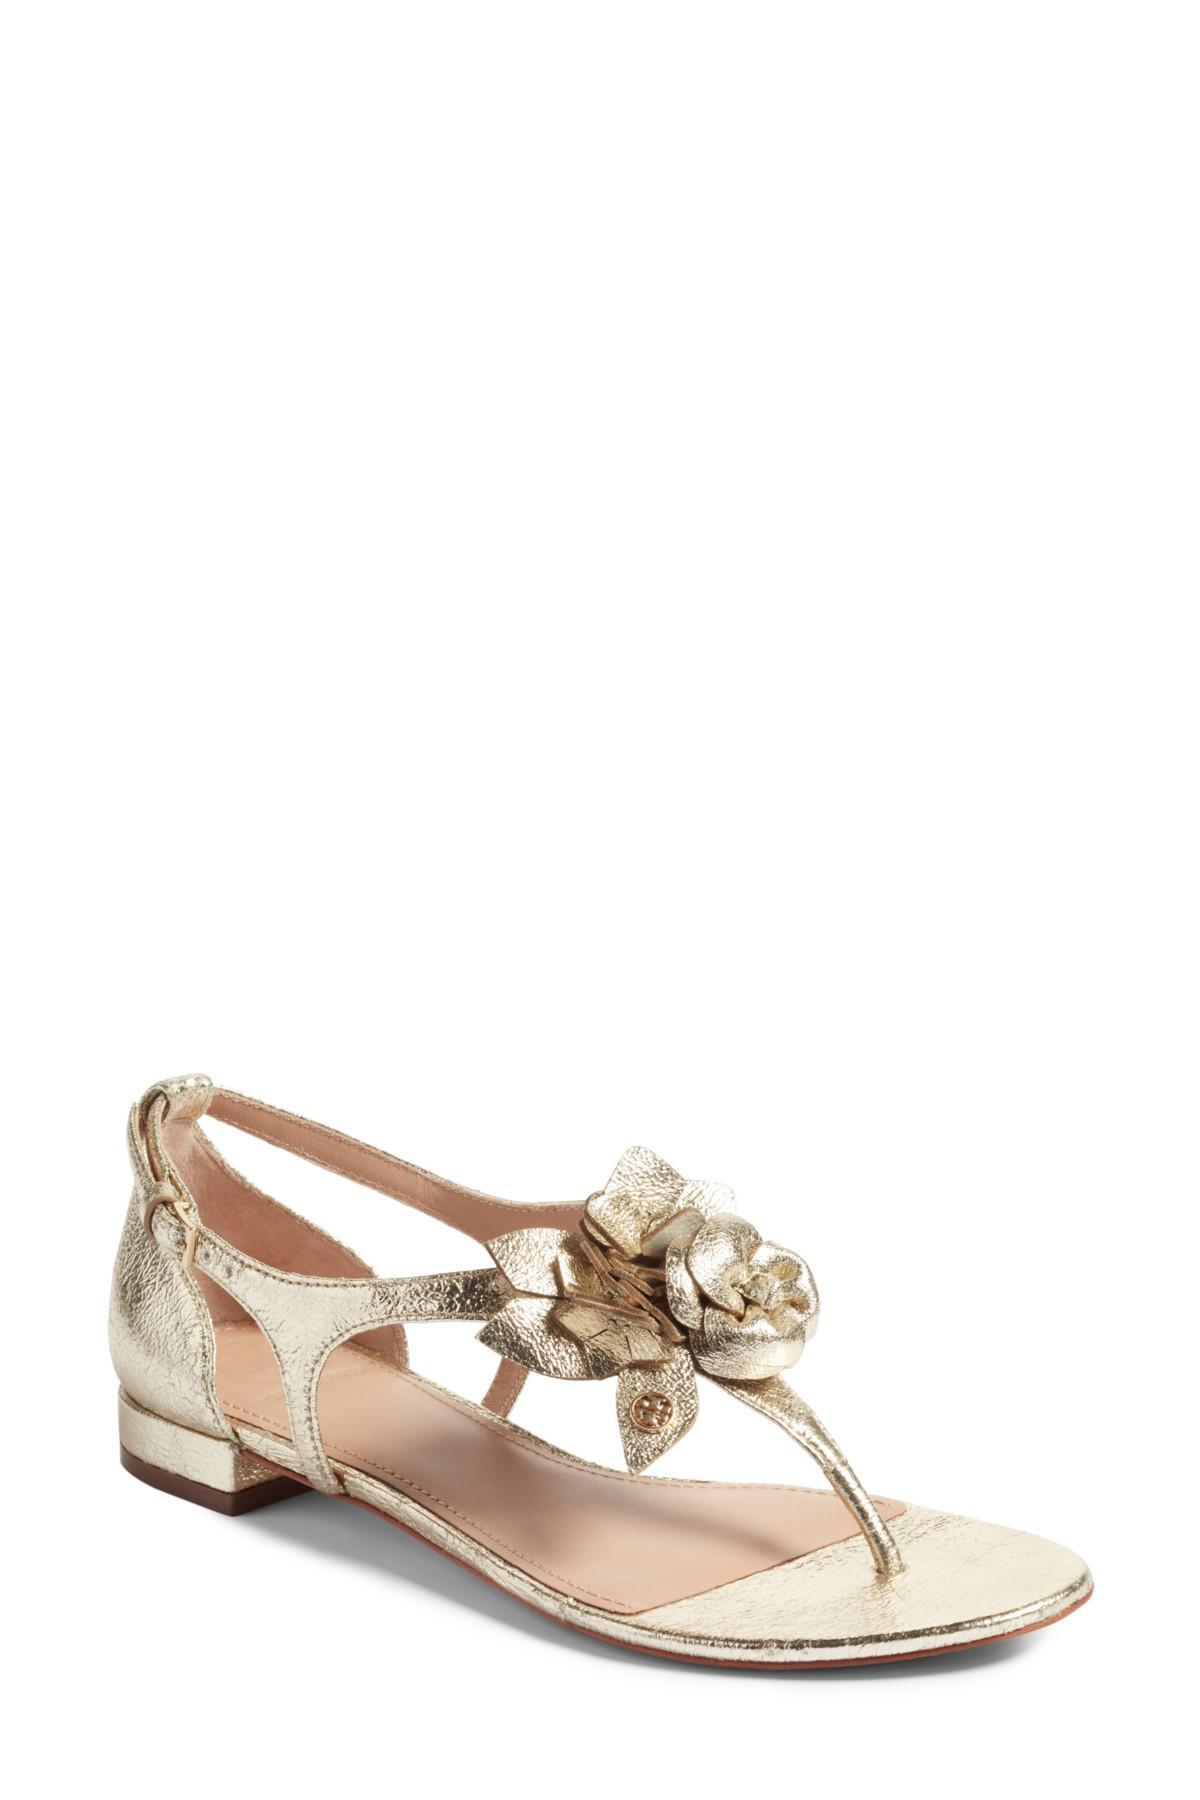 5f2a37e8678724 Lyst - Tory Burch Blossom Sandal in Metallic